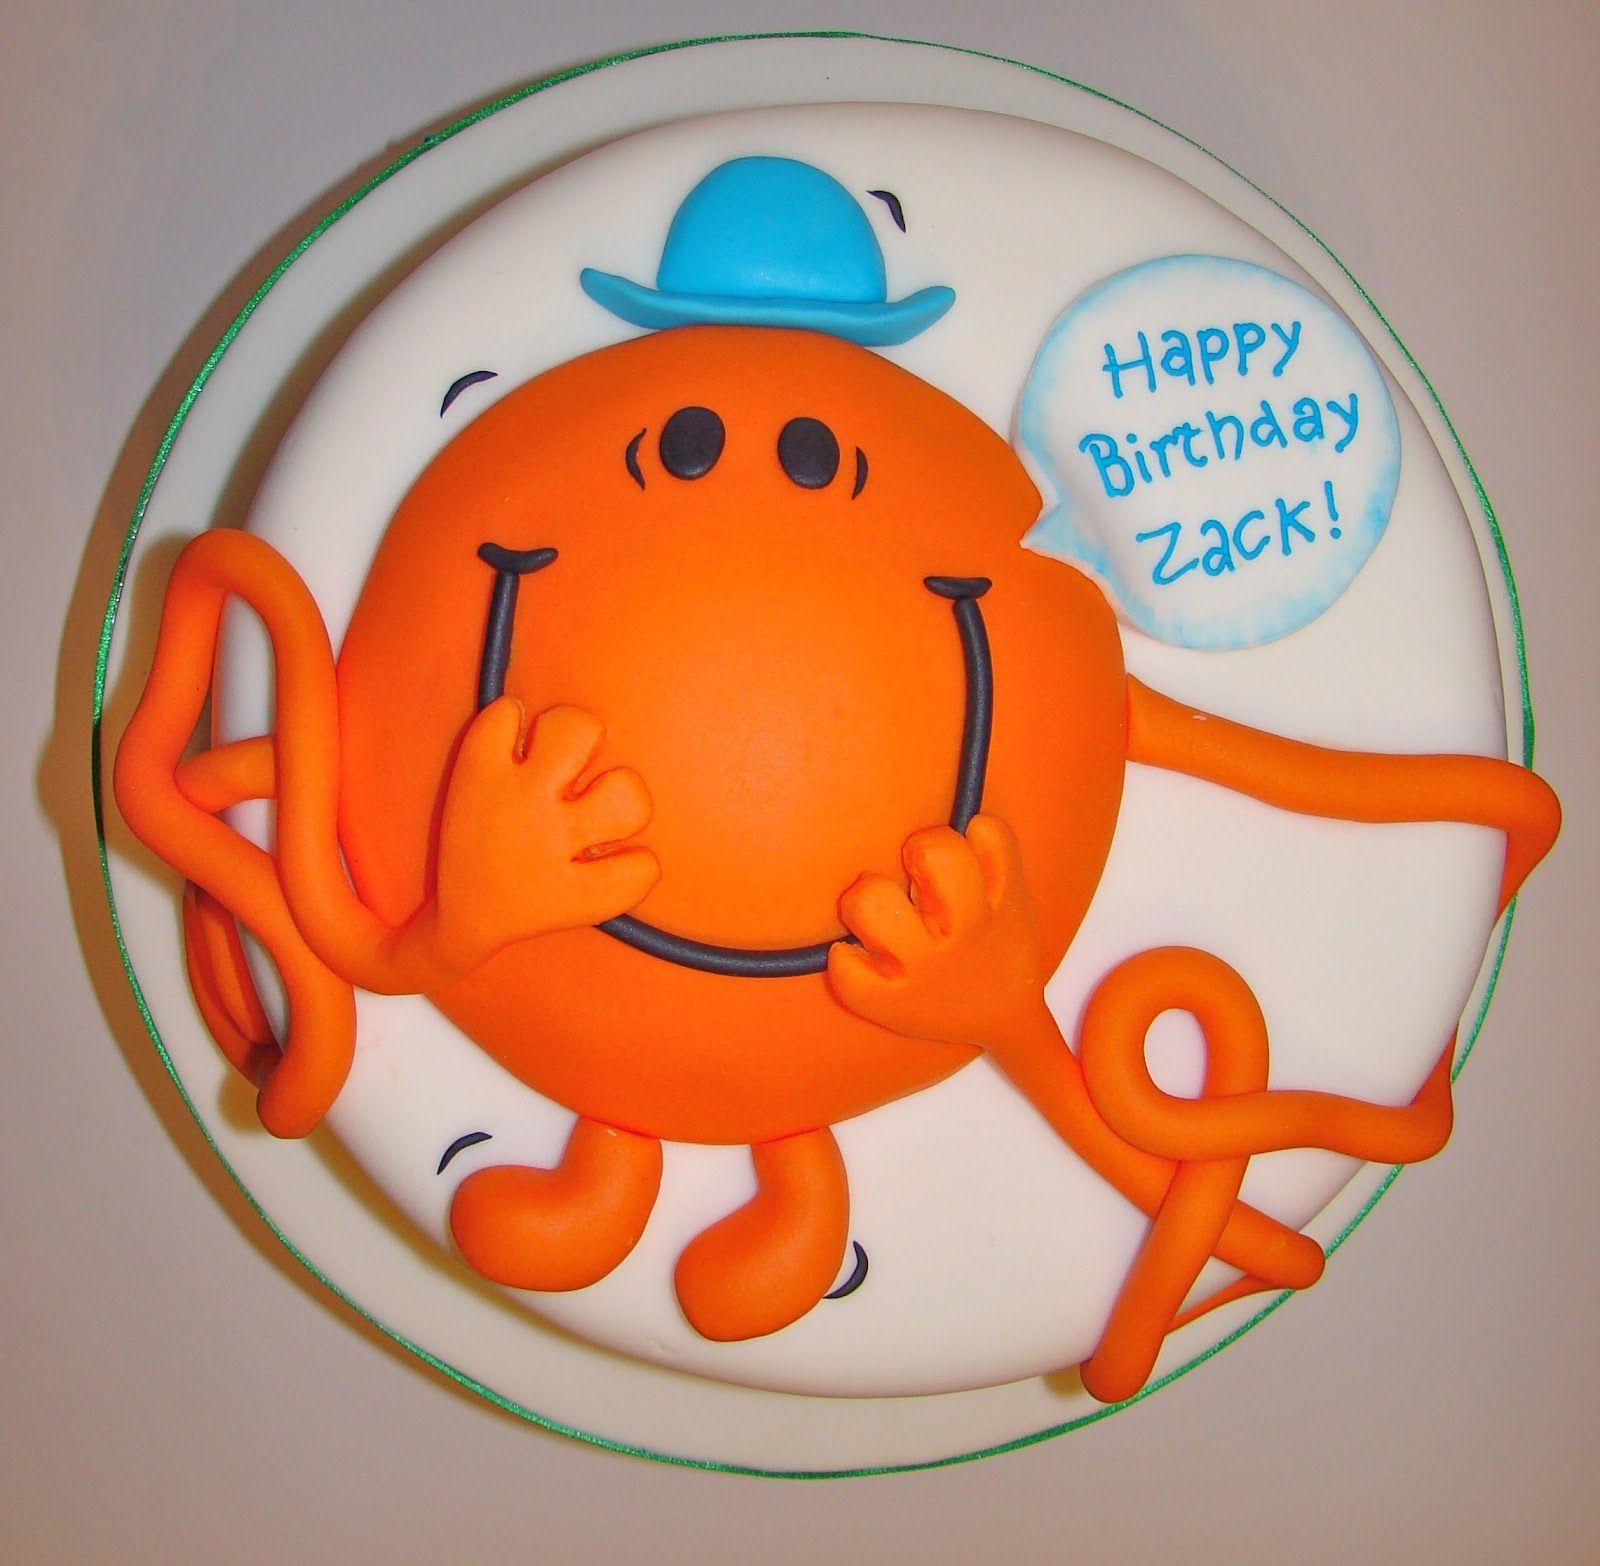 Mr Tickle Birthday Cake Foodies Pinterest Birthday Cakes - Mr tickle birthday cake